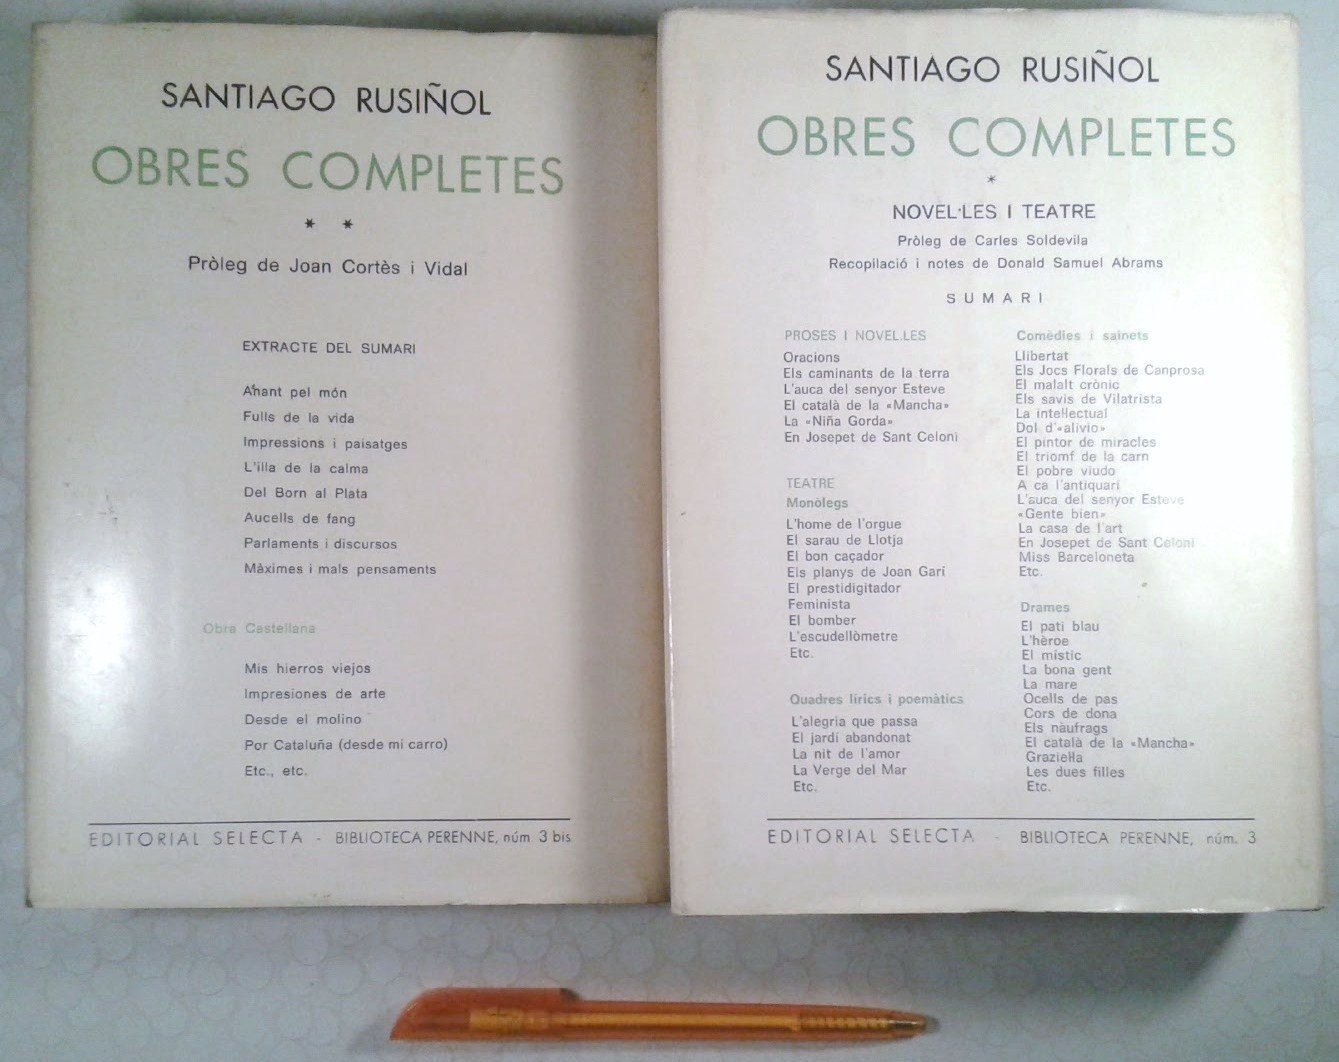 Obres completes (Biblioteca perenne ; v. 3) (Catalan Edition): Santiago Rusiñol: 9788429805697: Amazon.com: Books